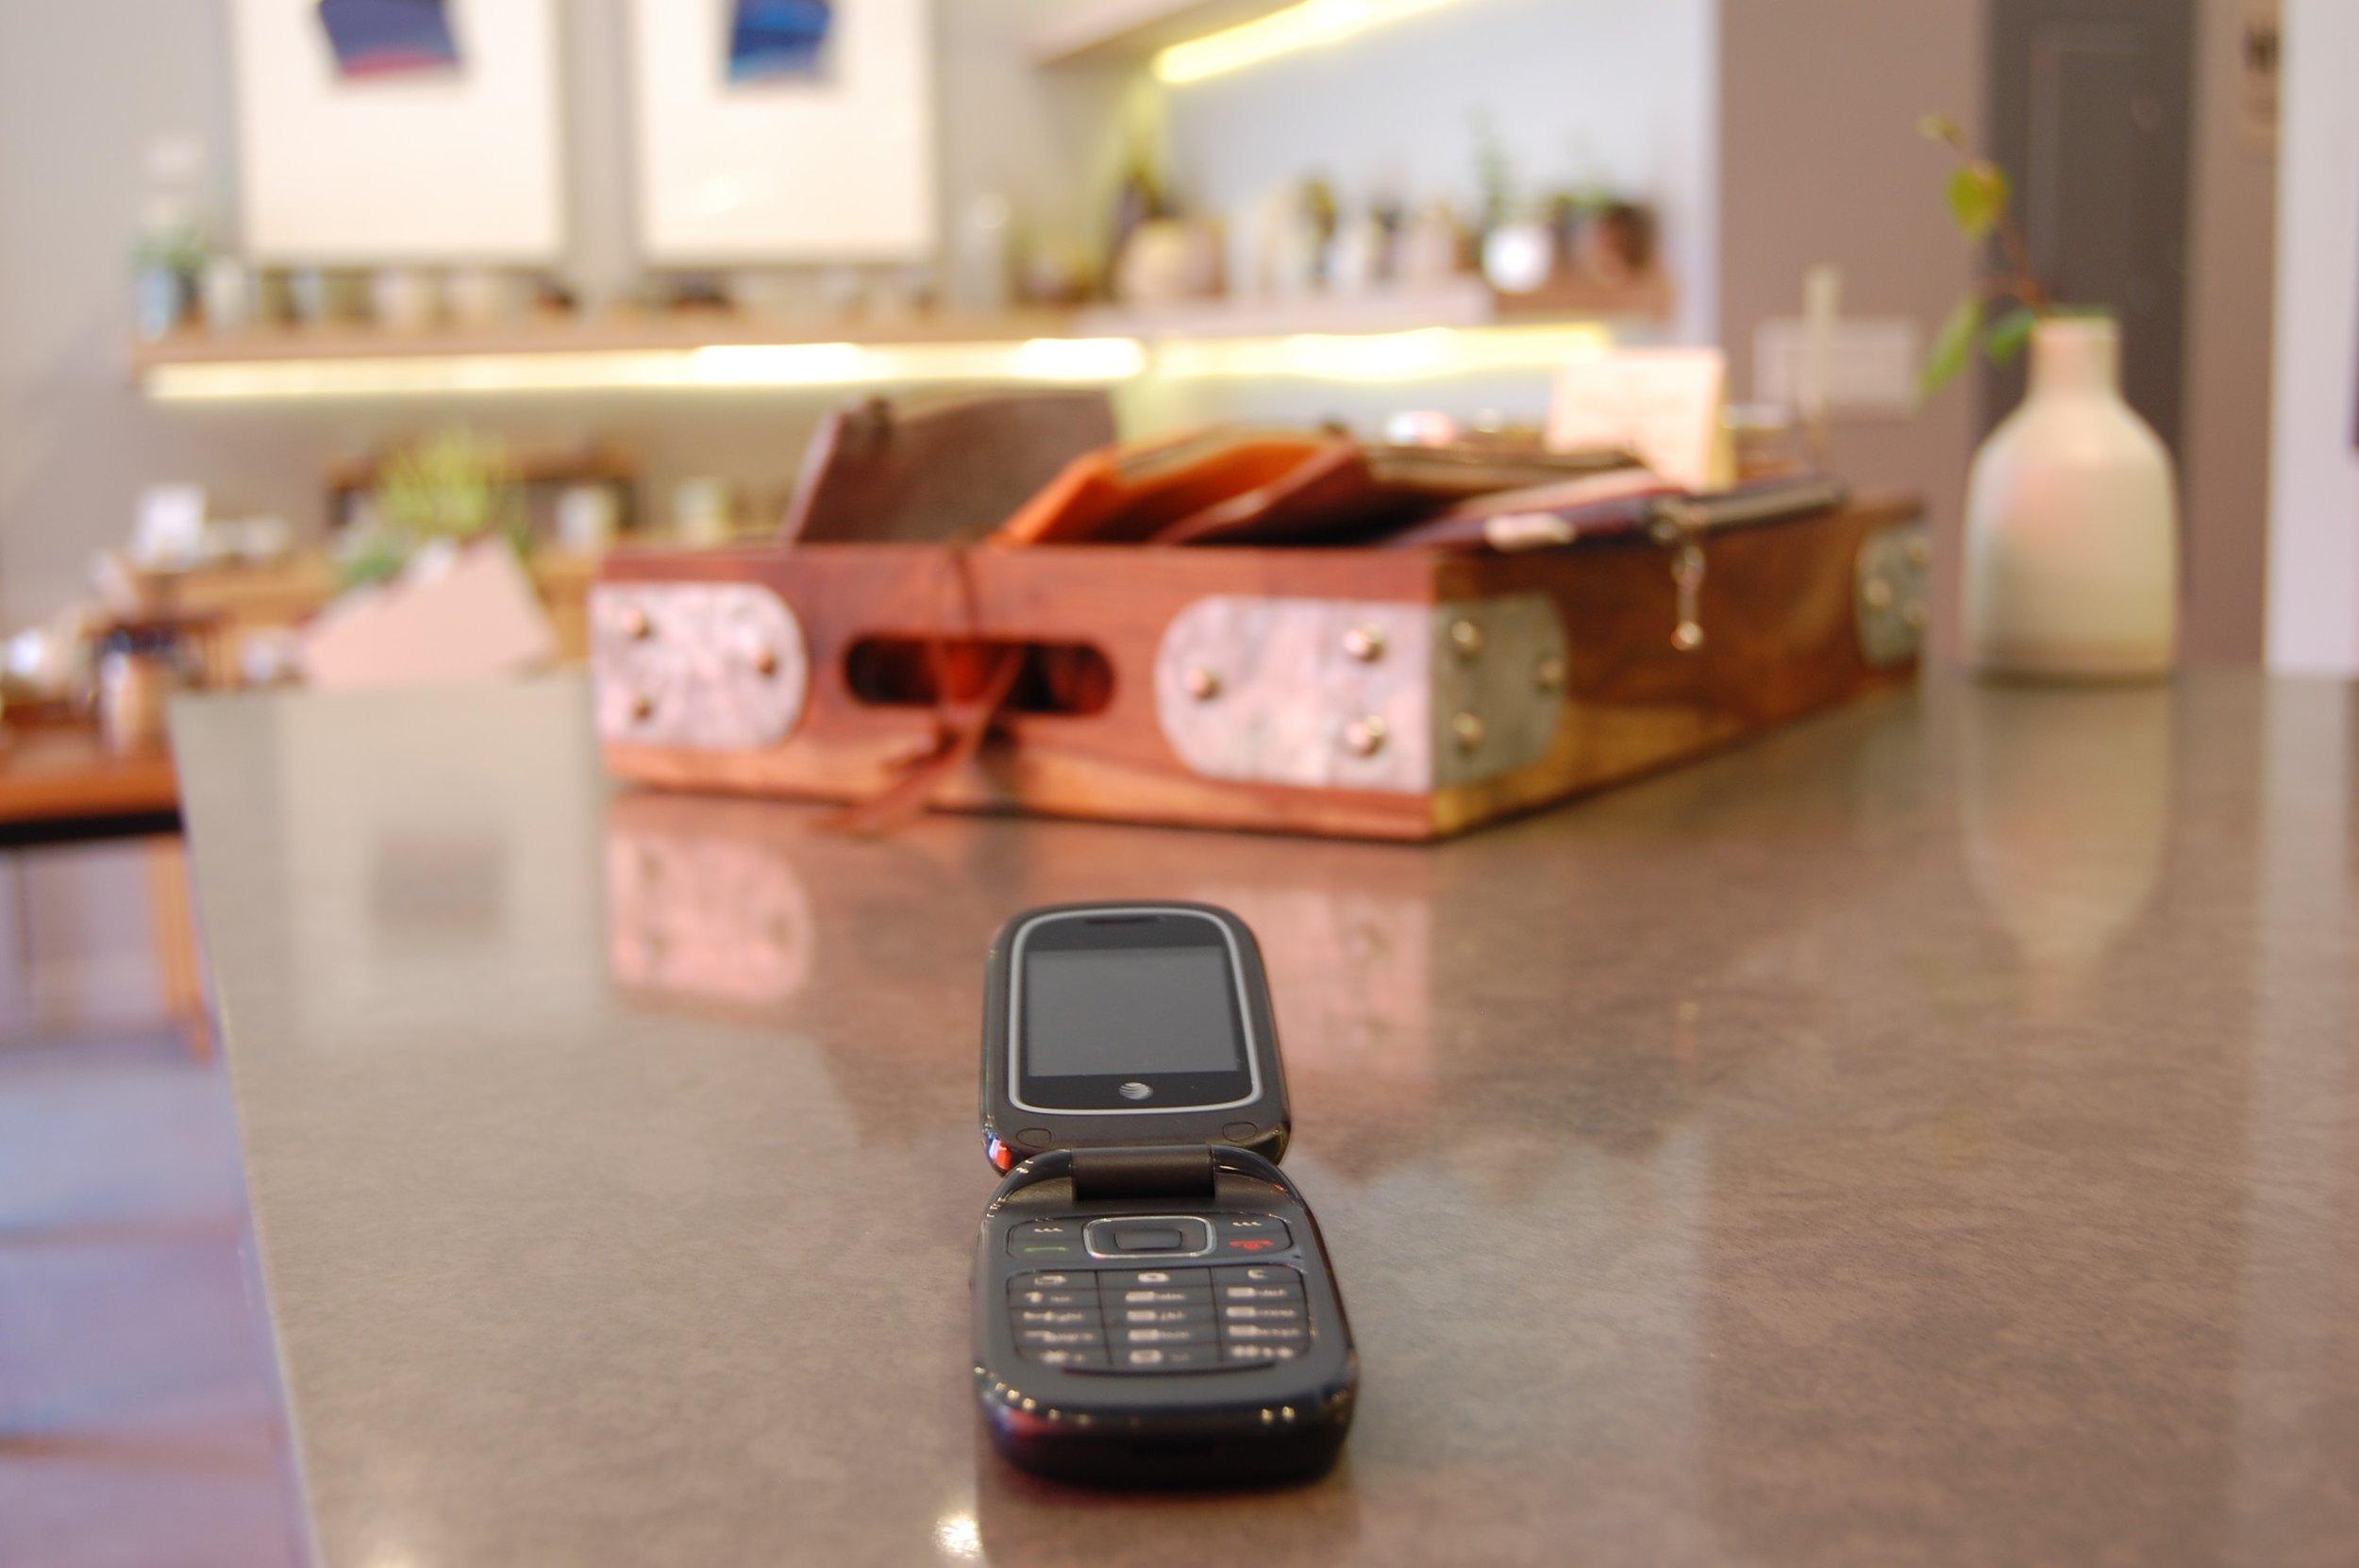 My Flip Phone.